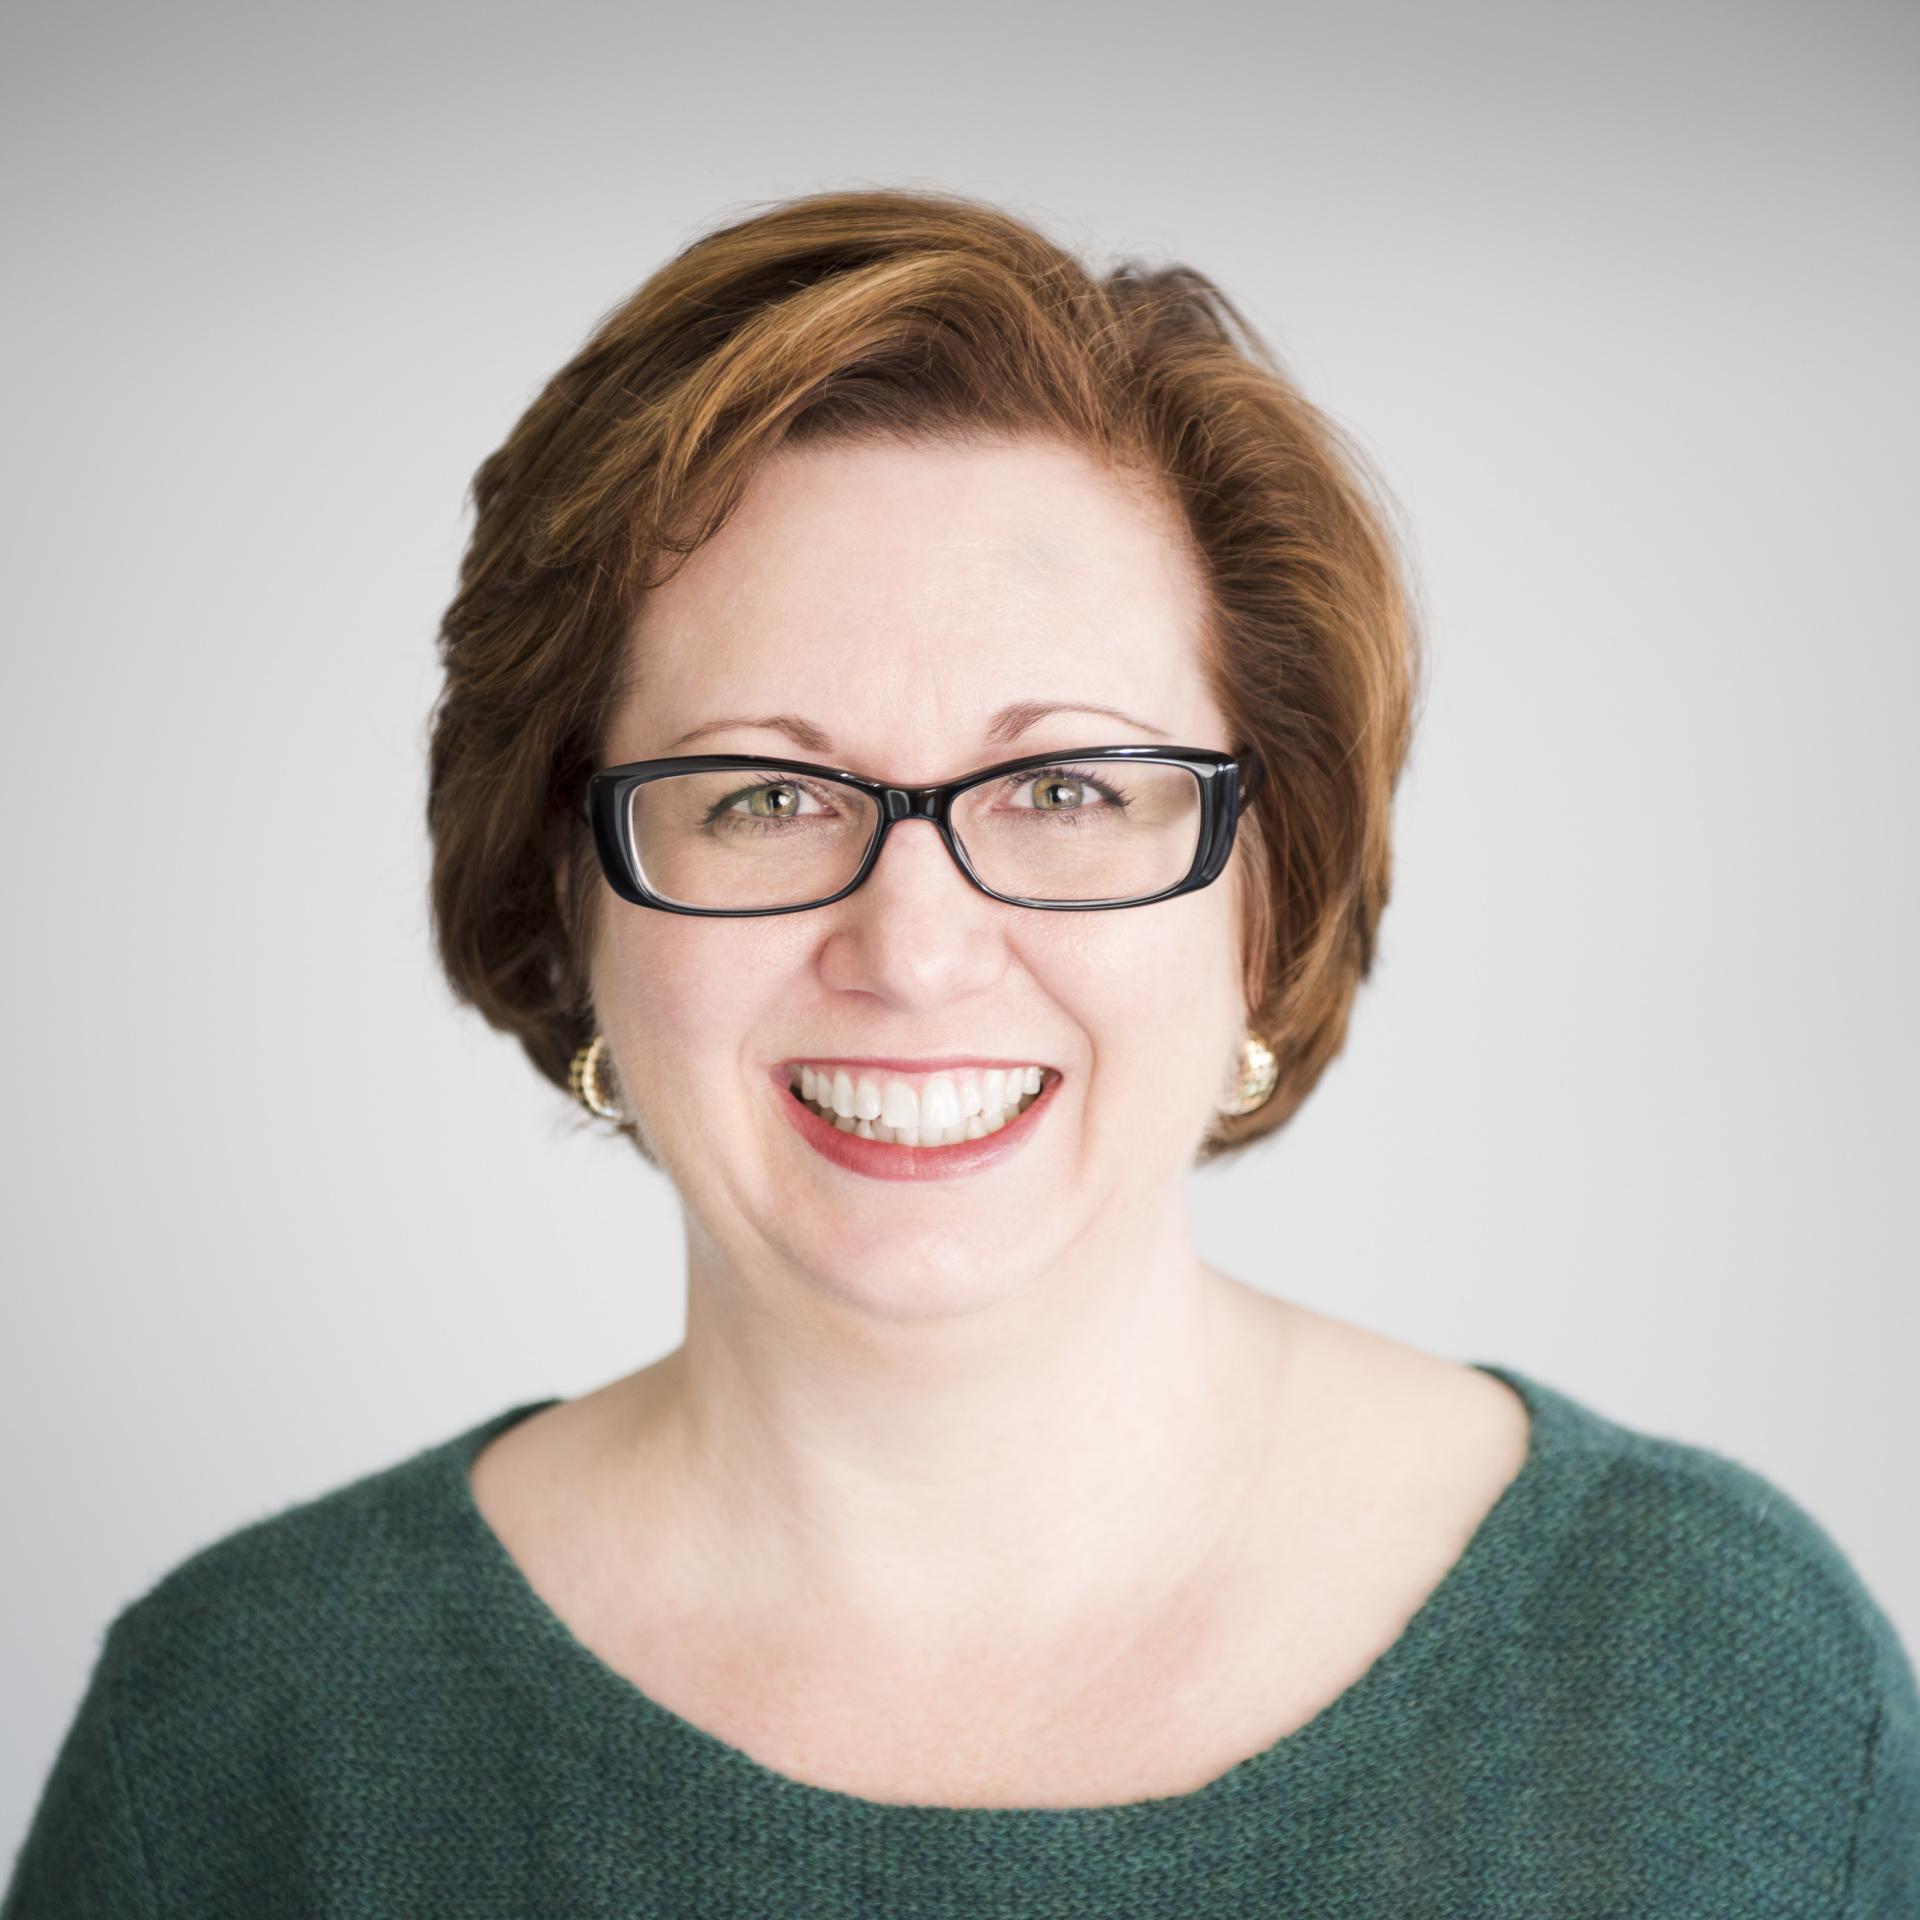 Megan Hertzler